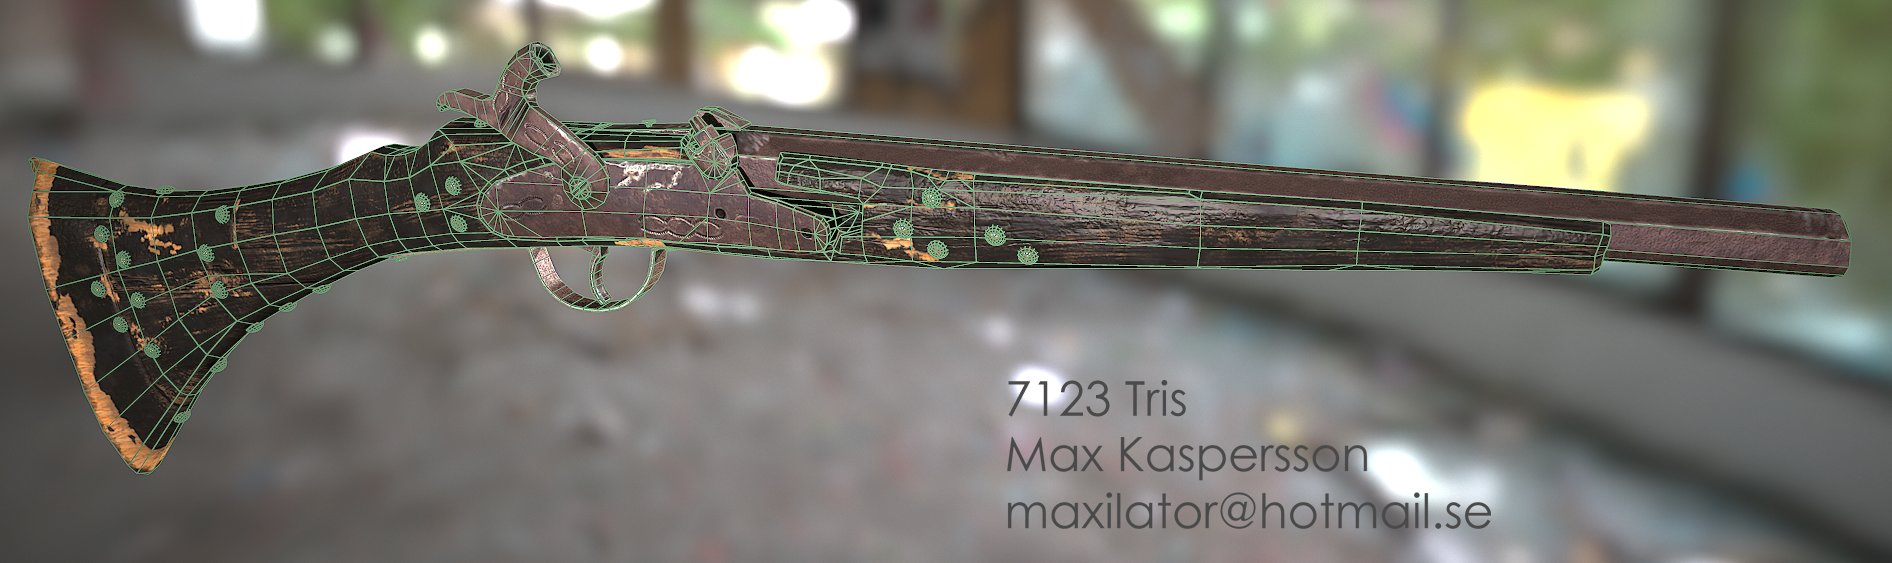 Max kaspersson wire